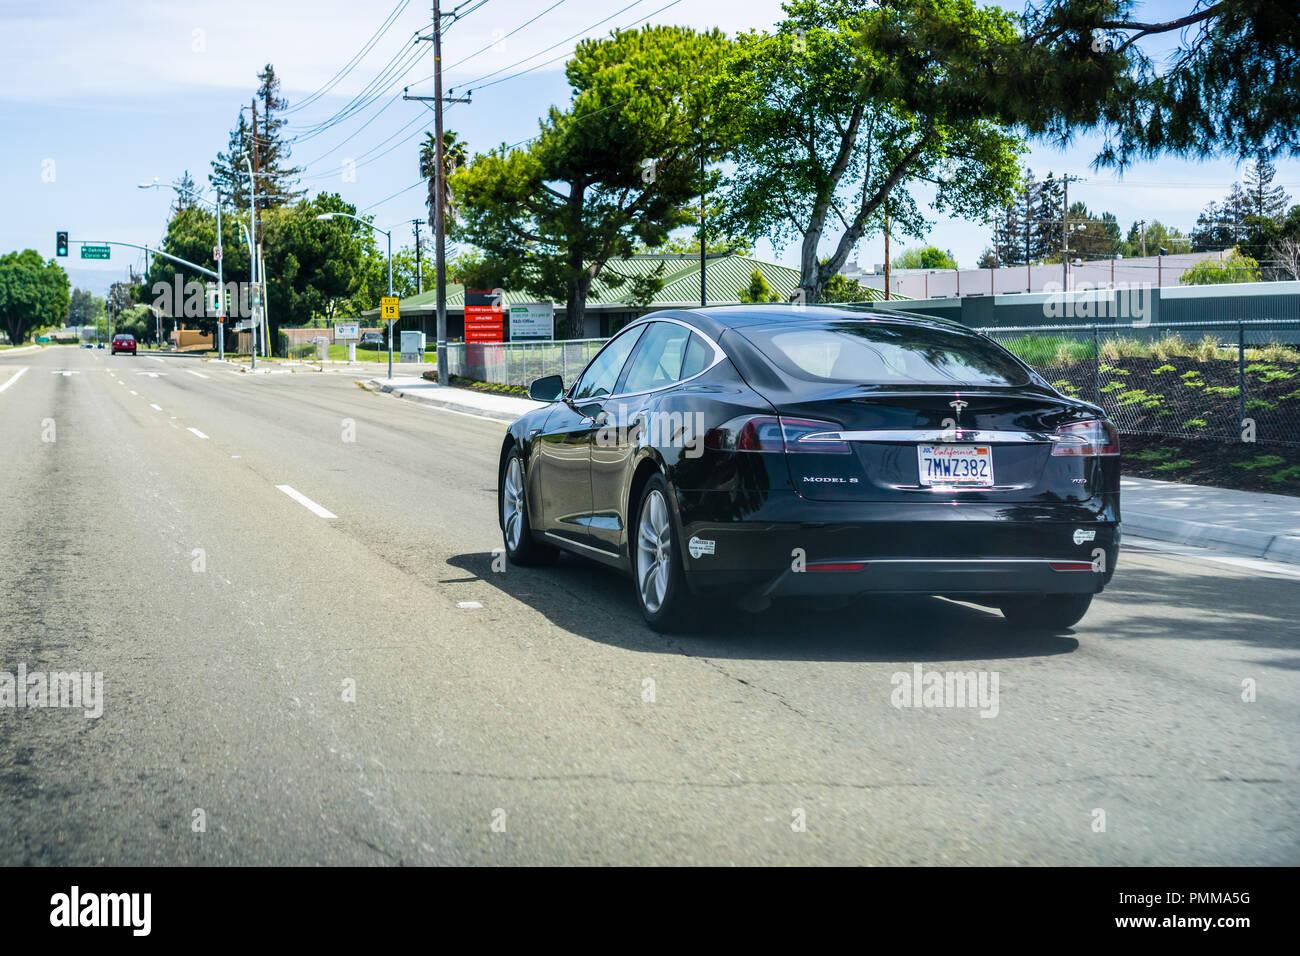 April 22, 2018 Santa Clara / CA / USA - Black Tesla Model S driving on a street in Silicon Valley Stock Photo